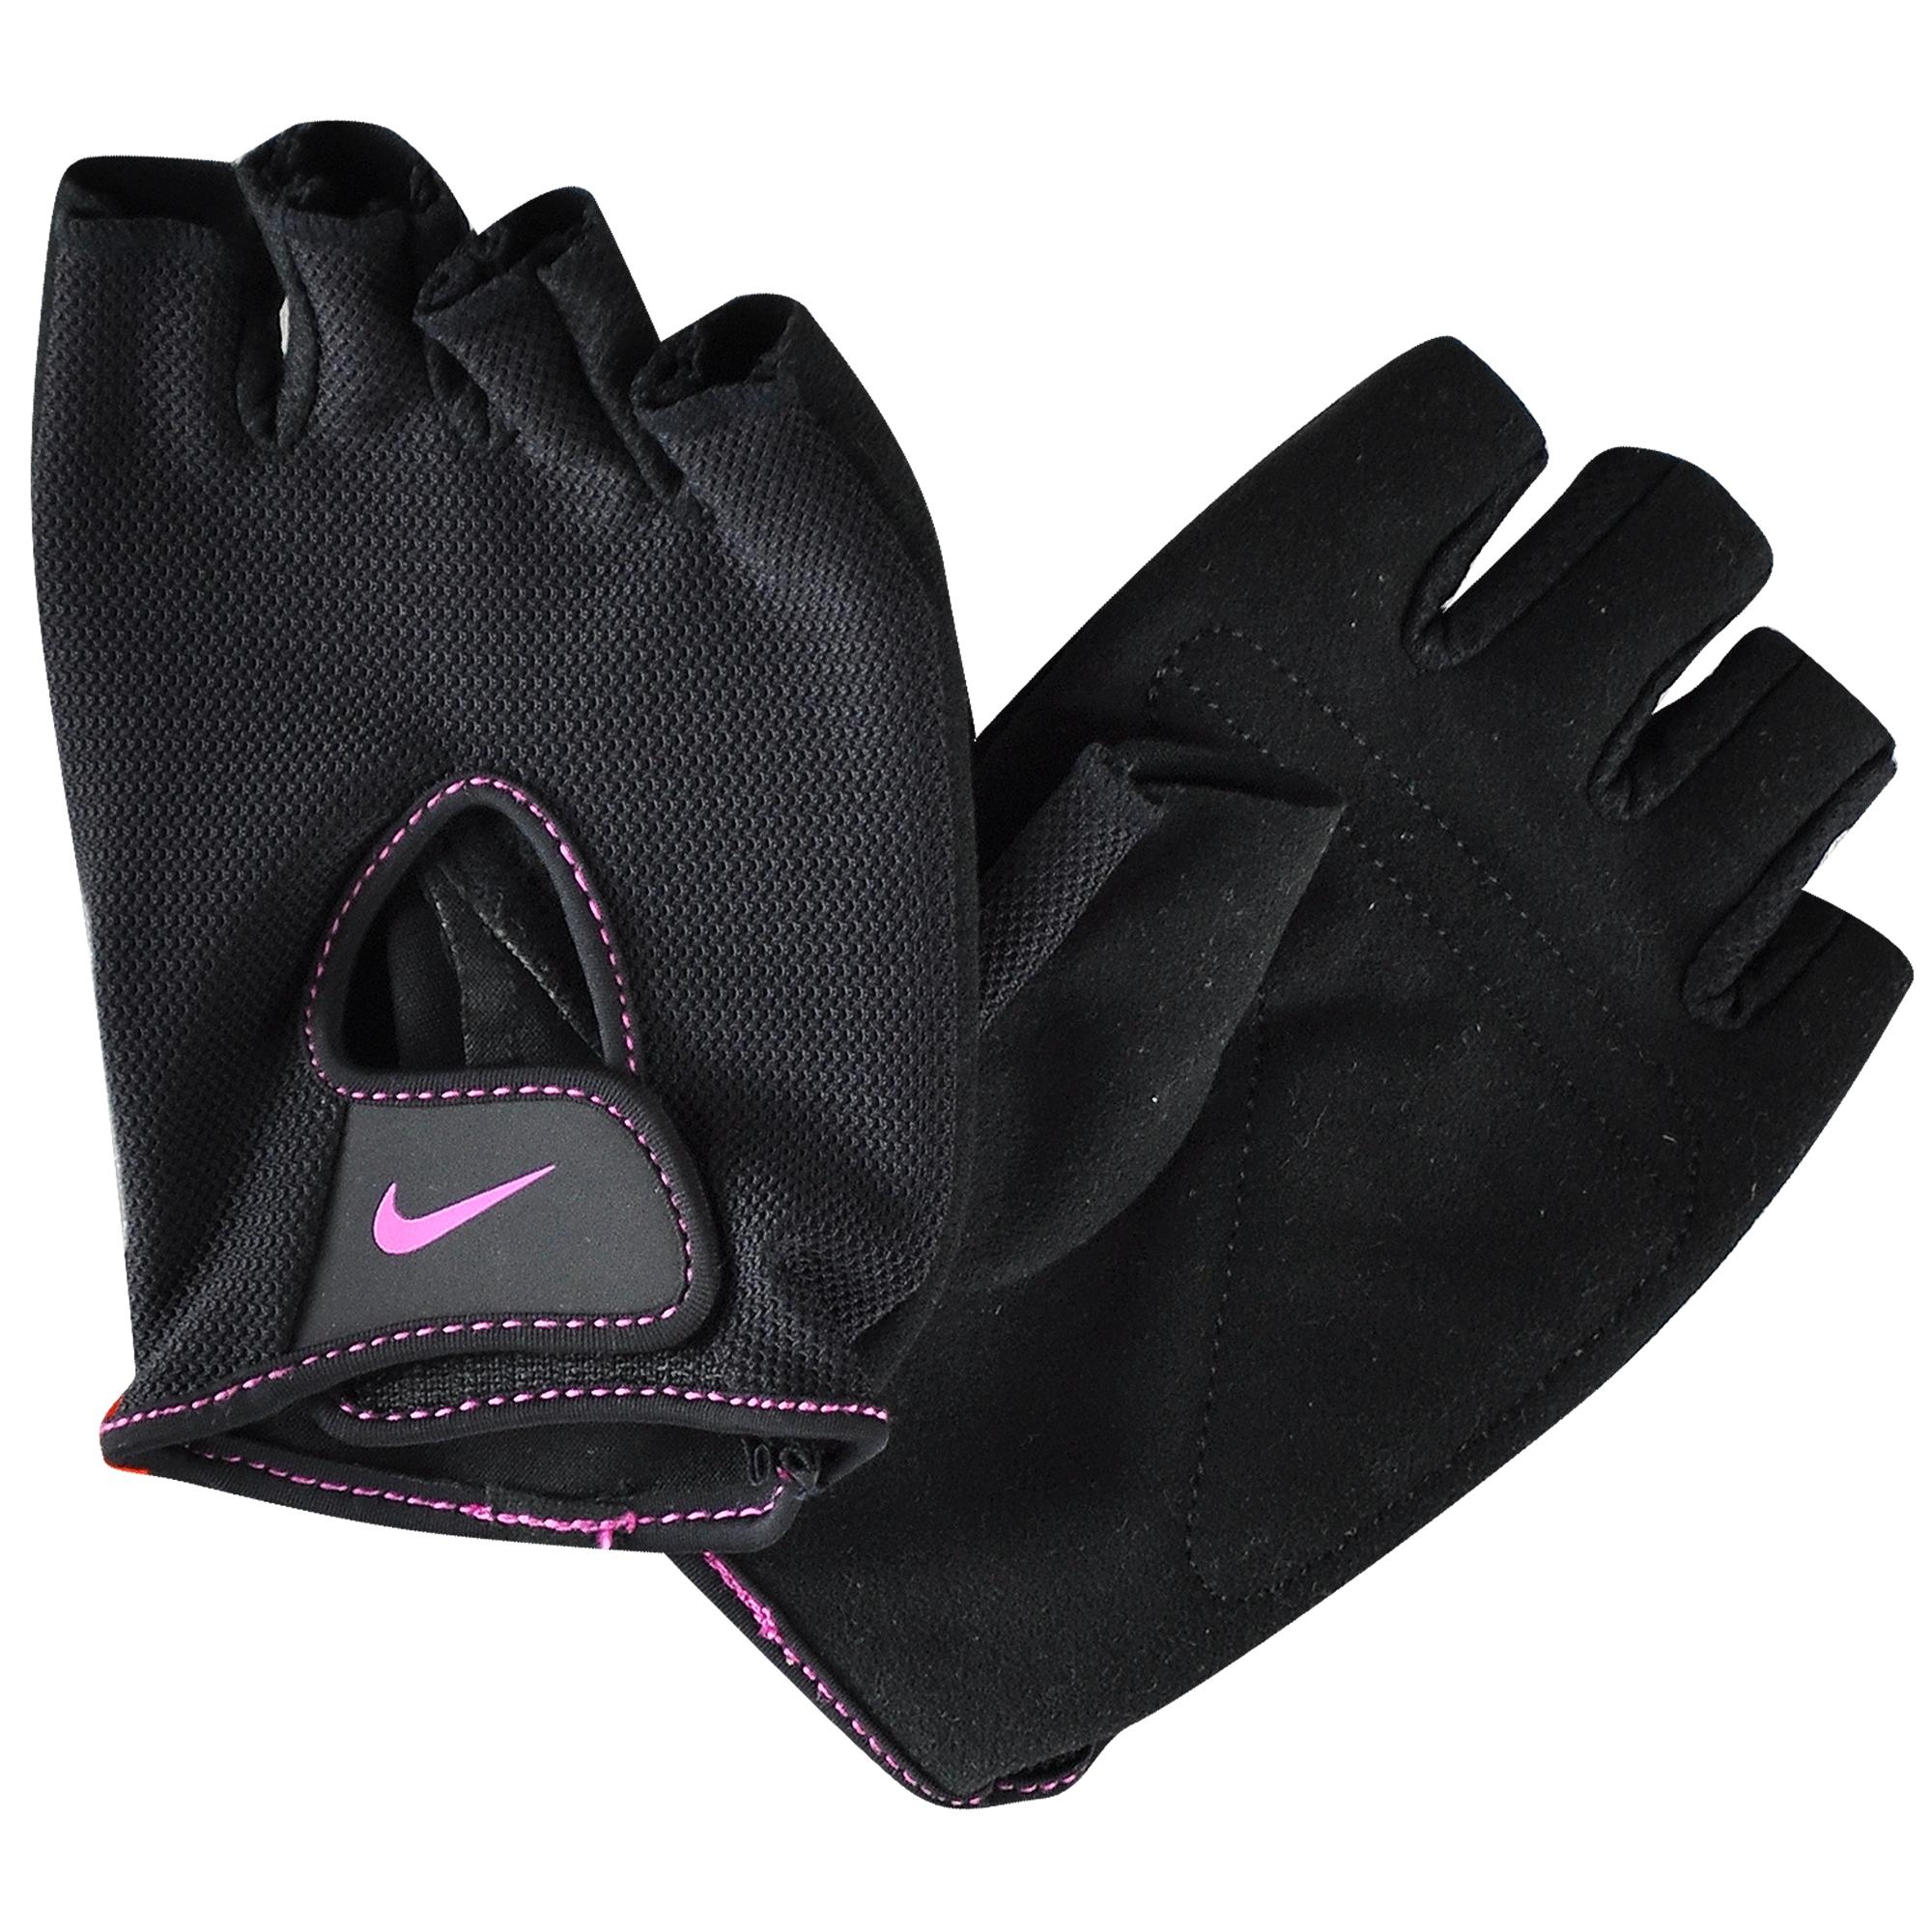 Nike Fundamental Training Gloves: Nike Fundamental Training Gloves II Fitness Eldiveni #N.LG